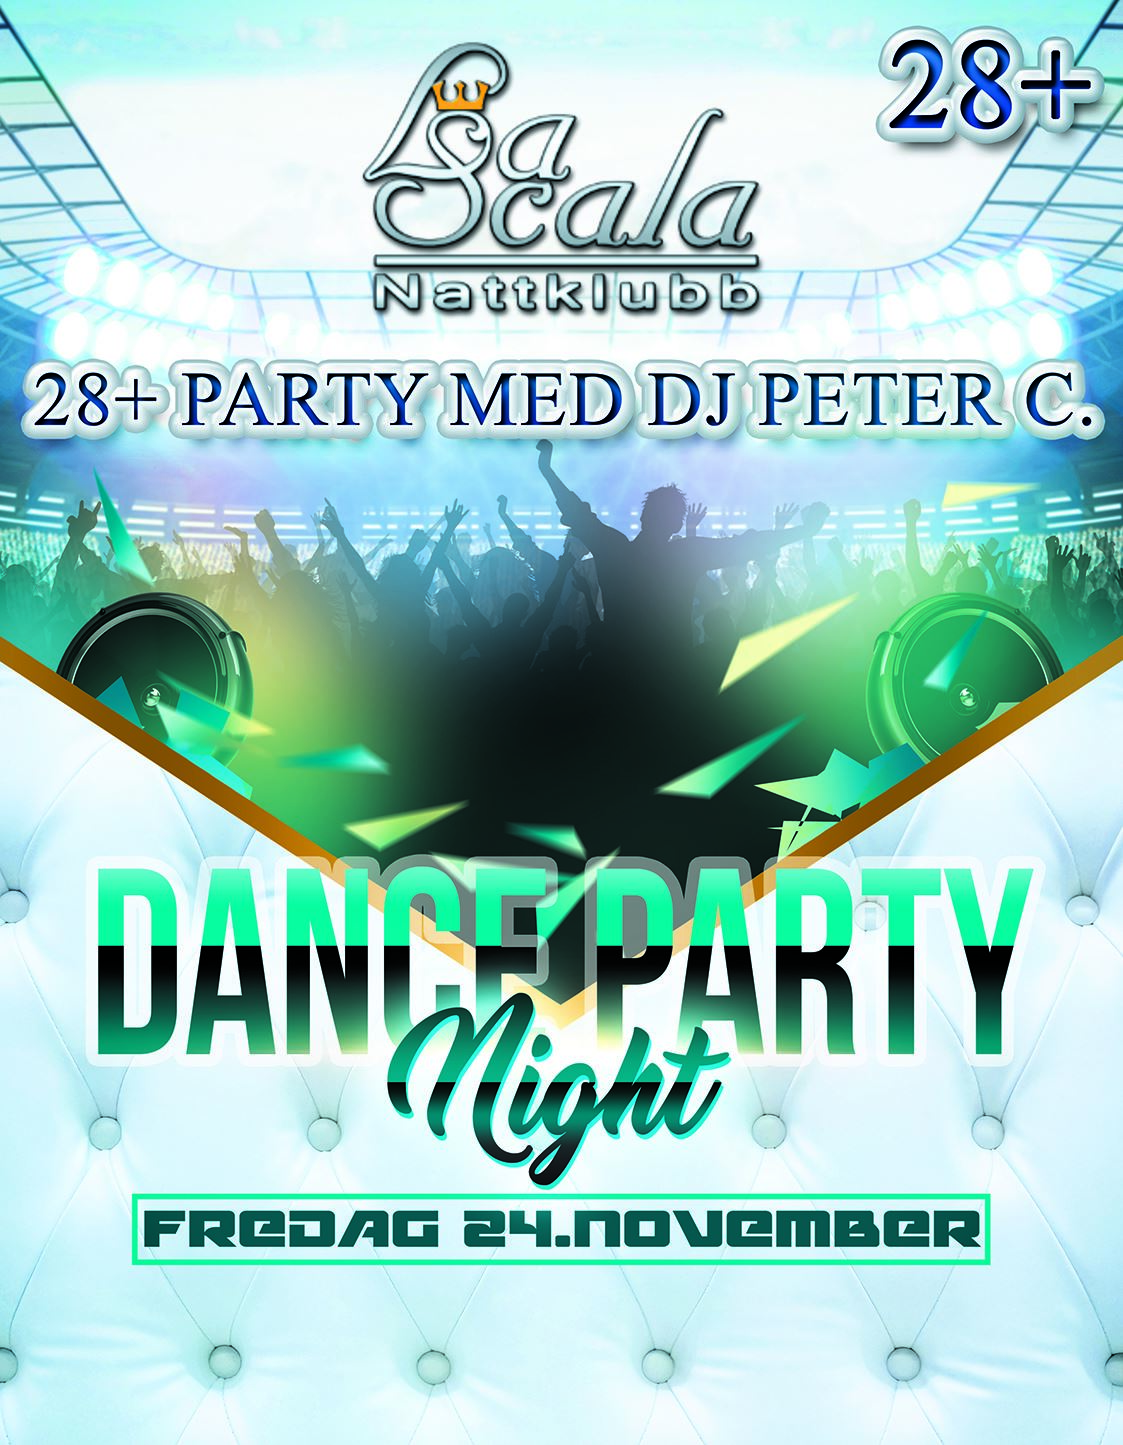 Dance Party Night 28+ på La Scala Nattklubb